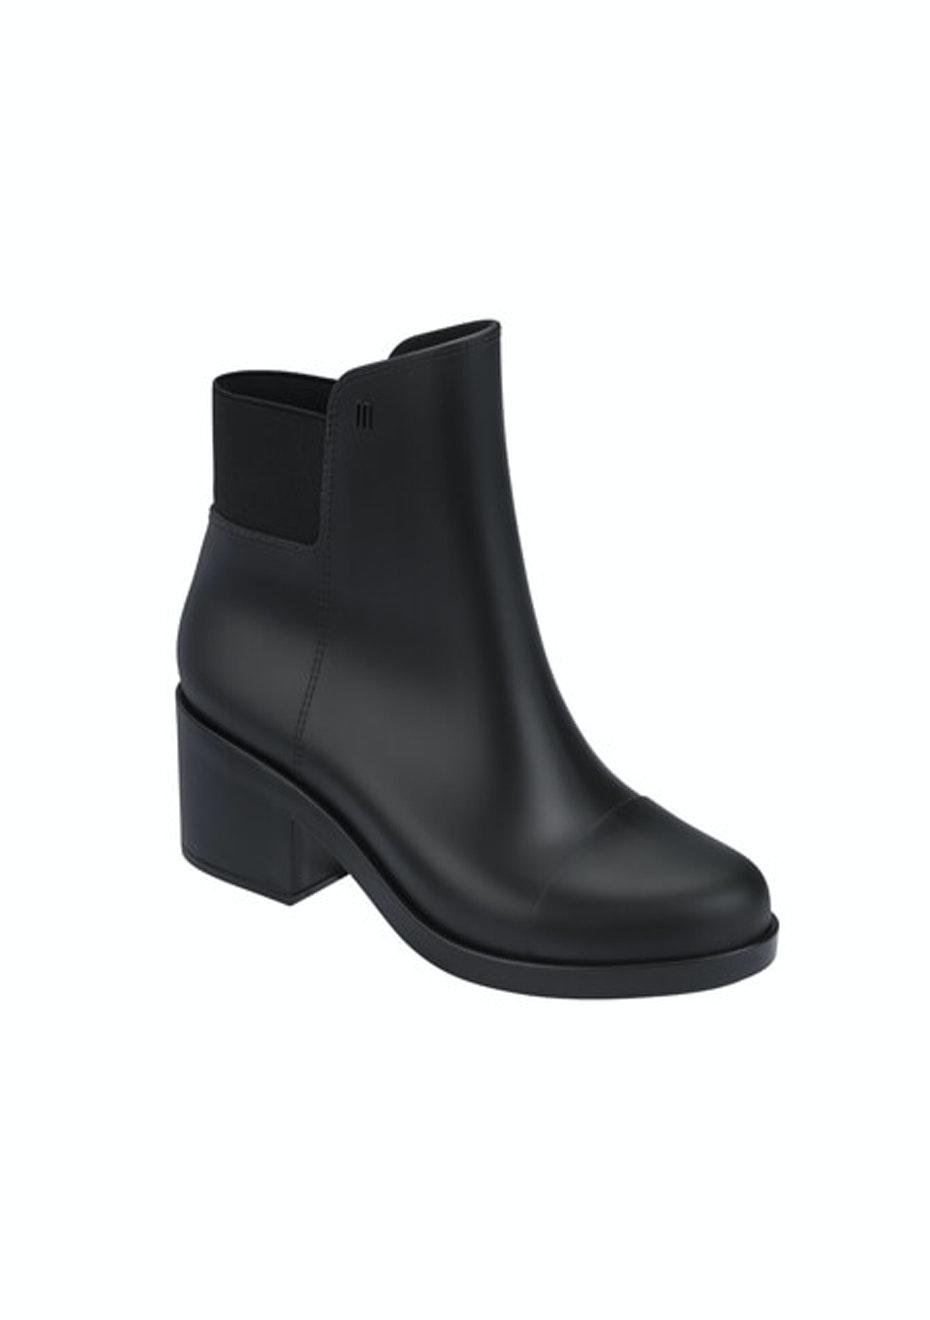 Melissa - Elastic Boot - Black